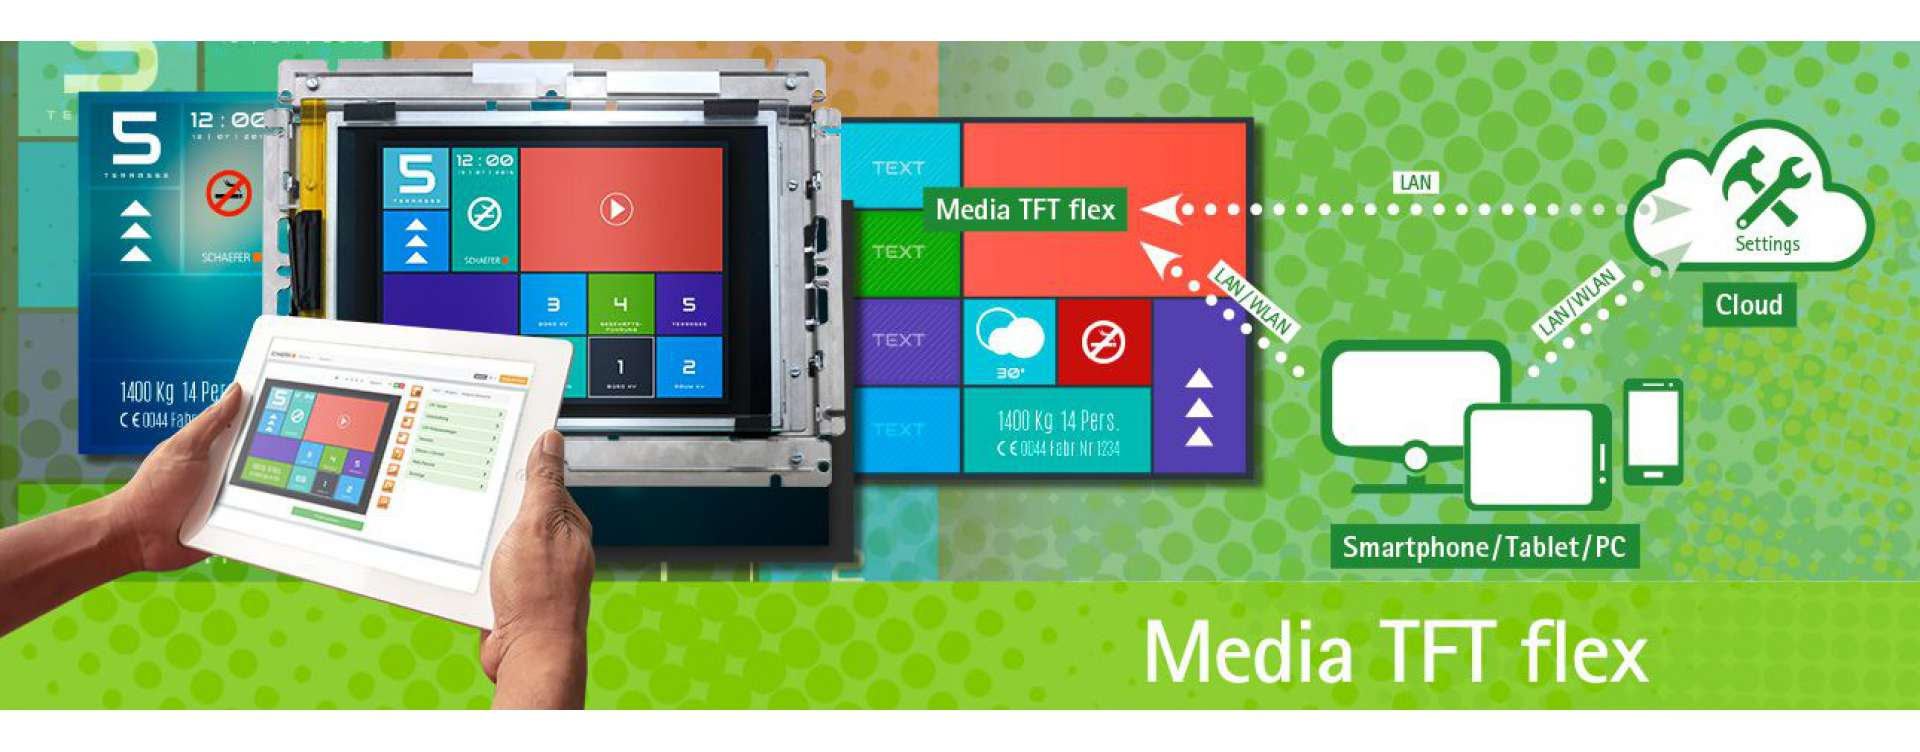 (Touch) Media TFT flex